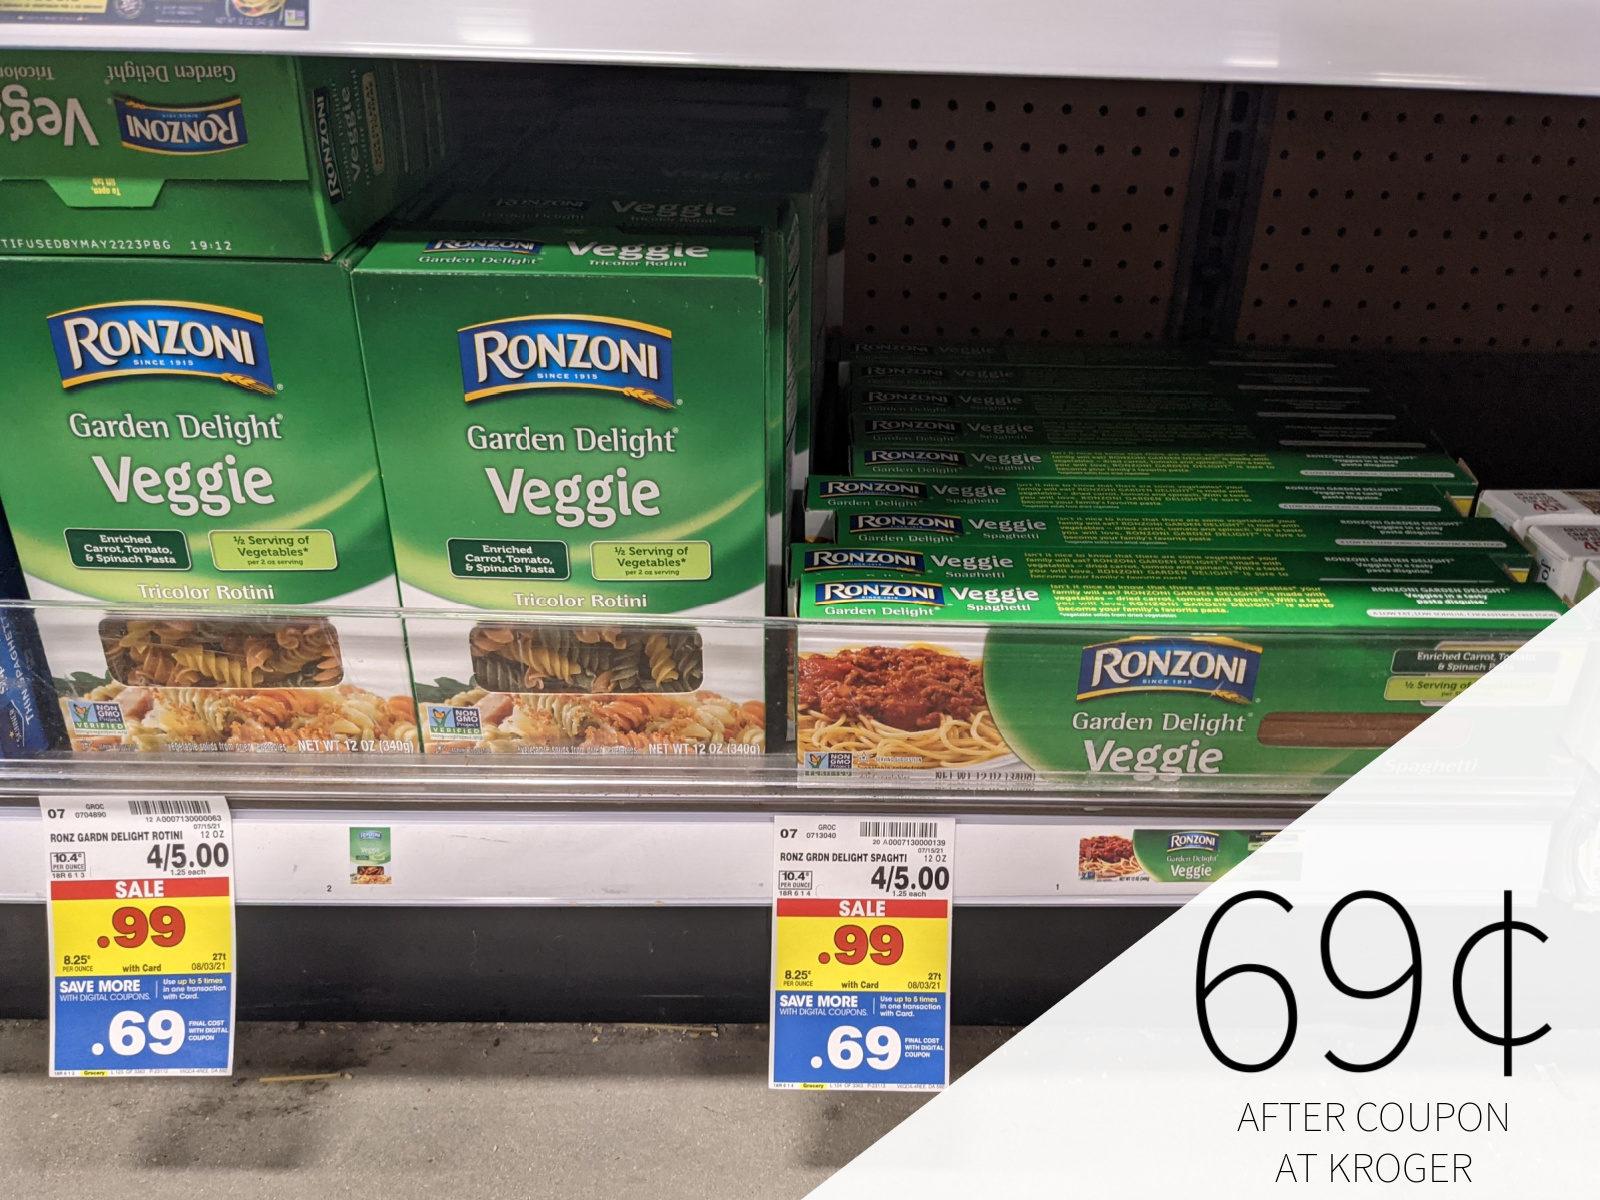 Ronzoni Garden Delight Pasta Only 69¢ At Kroger